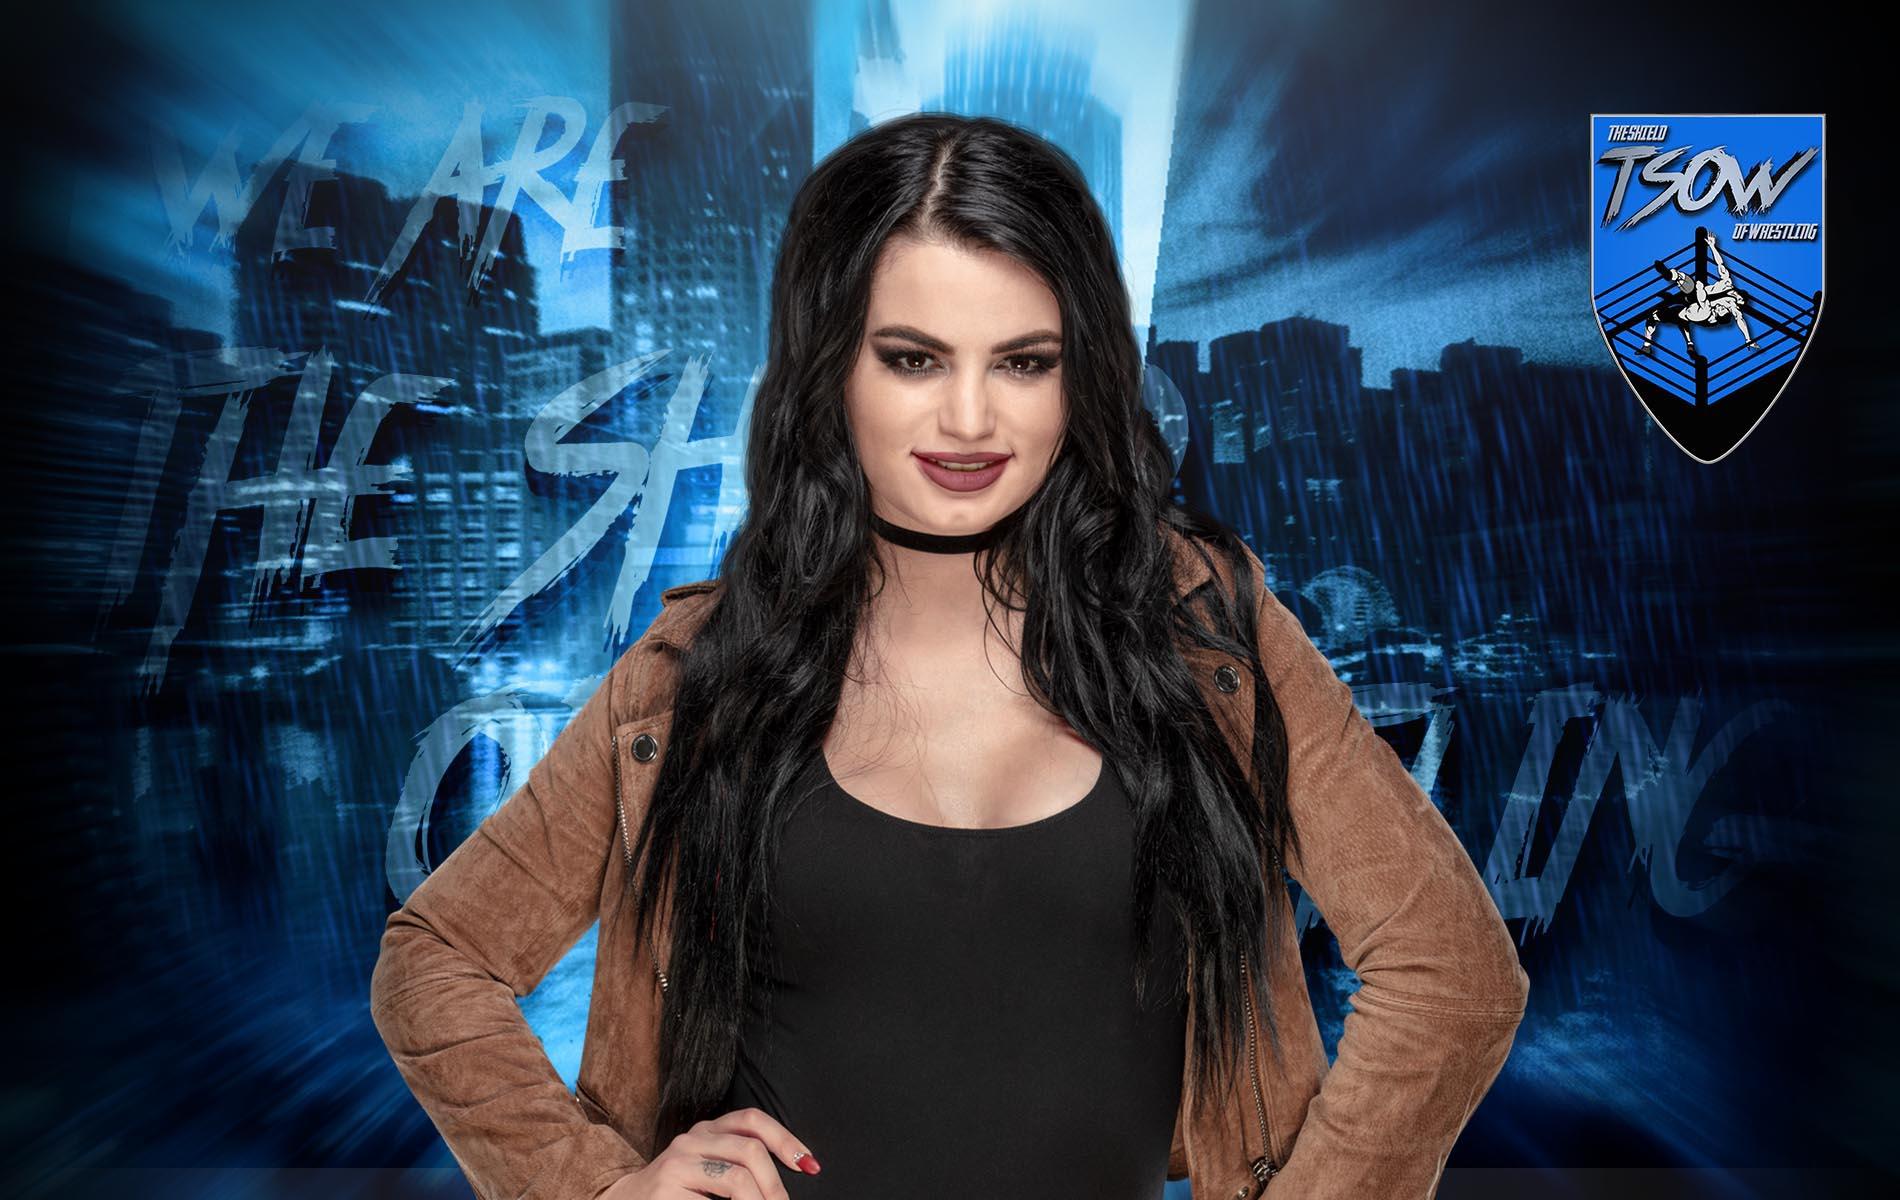 Paige si mostra bionda su Instagram